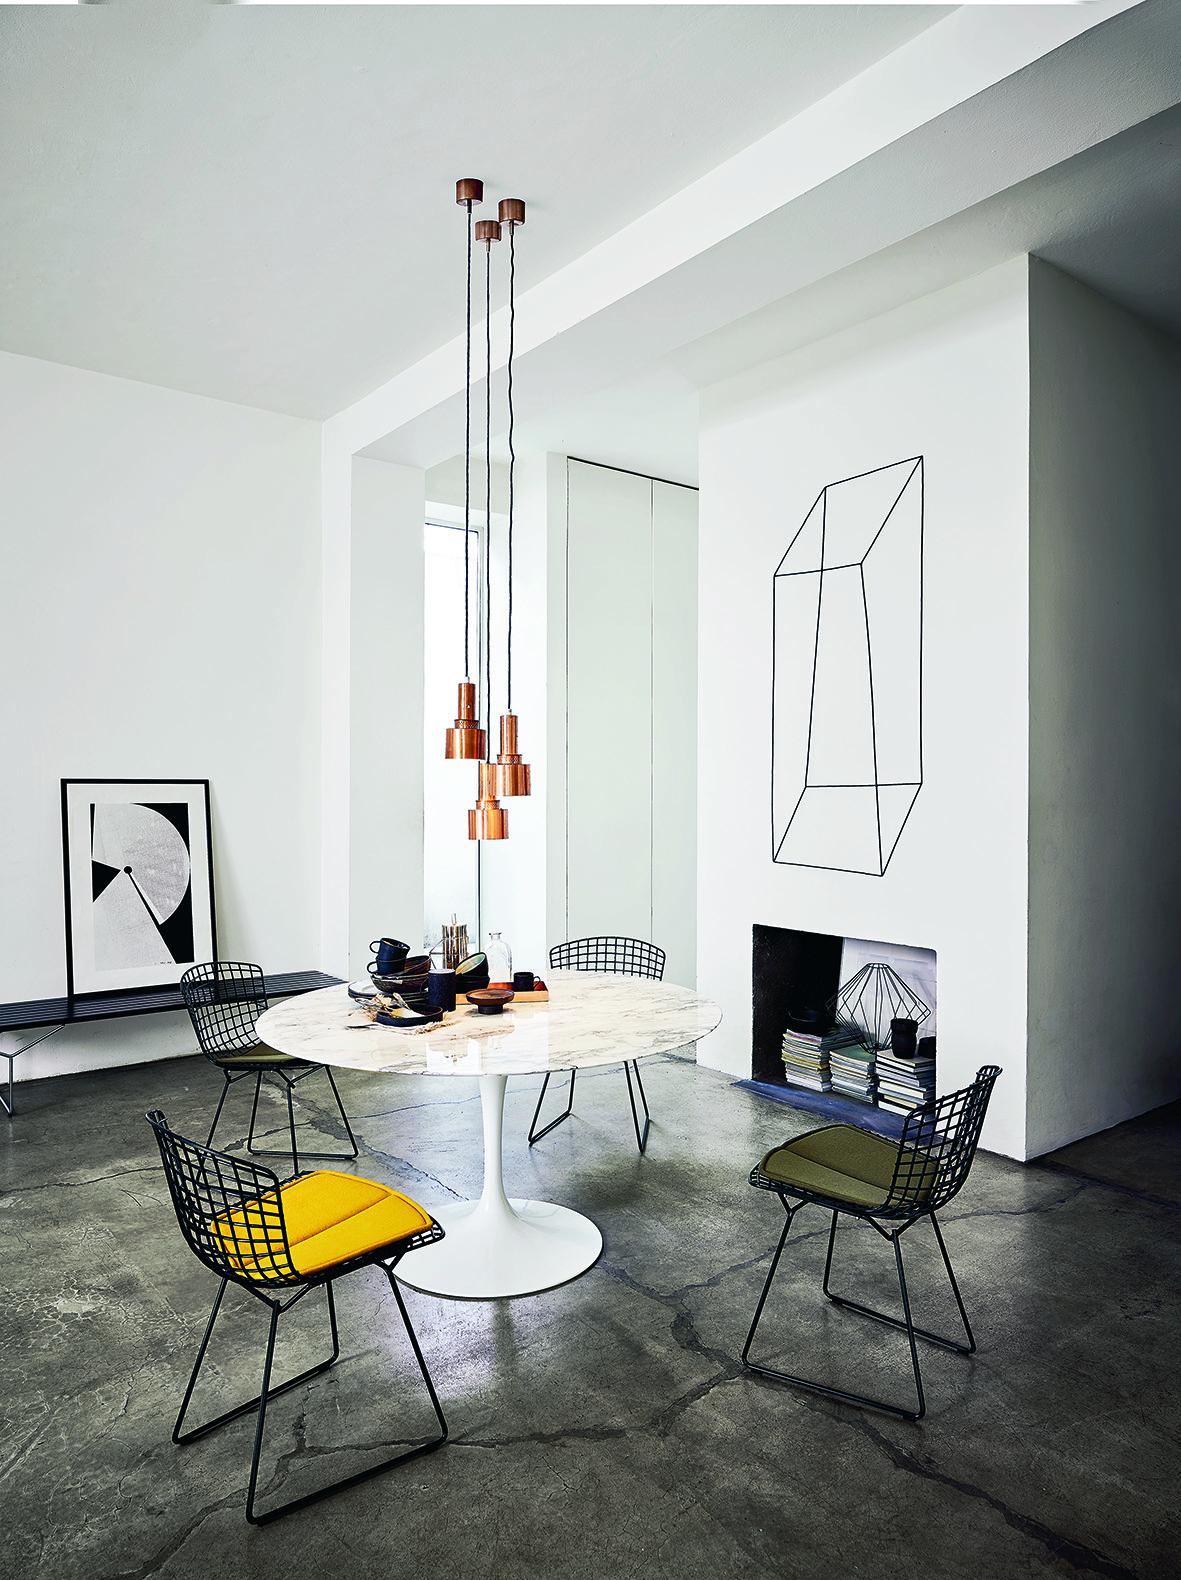 Knoll Bertoia Black saarinen pedestal barcelona chair mies van der rohe design meubels meubelwinkel loncin leuven hasselt antwerpen gent sint-truiden mechelen brussels bruxelles.jpg